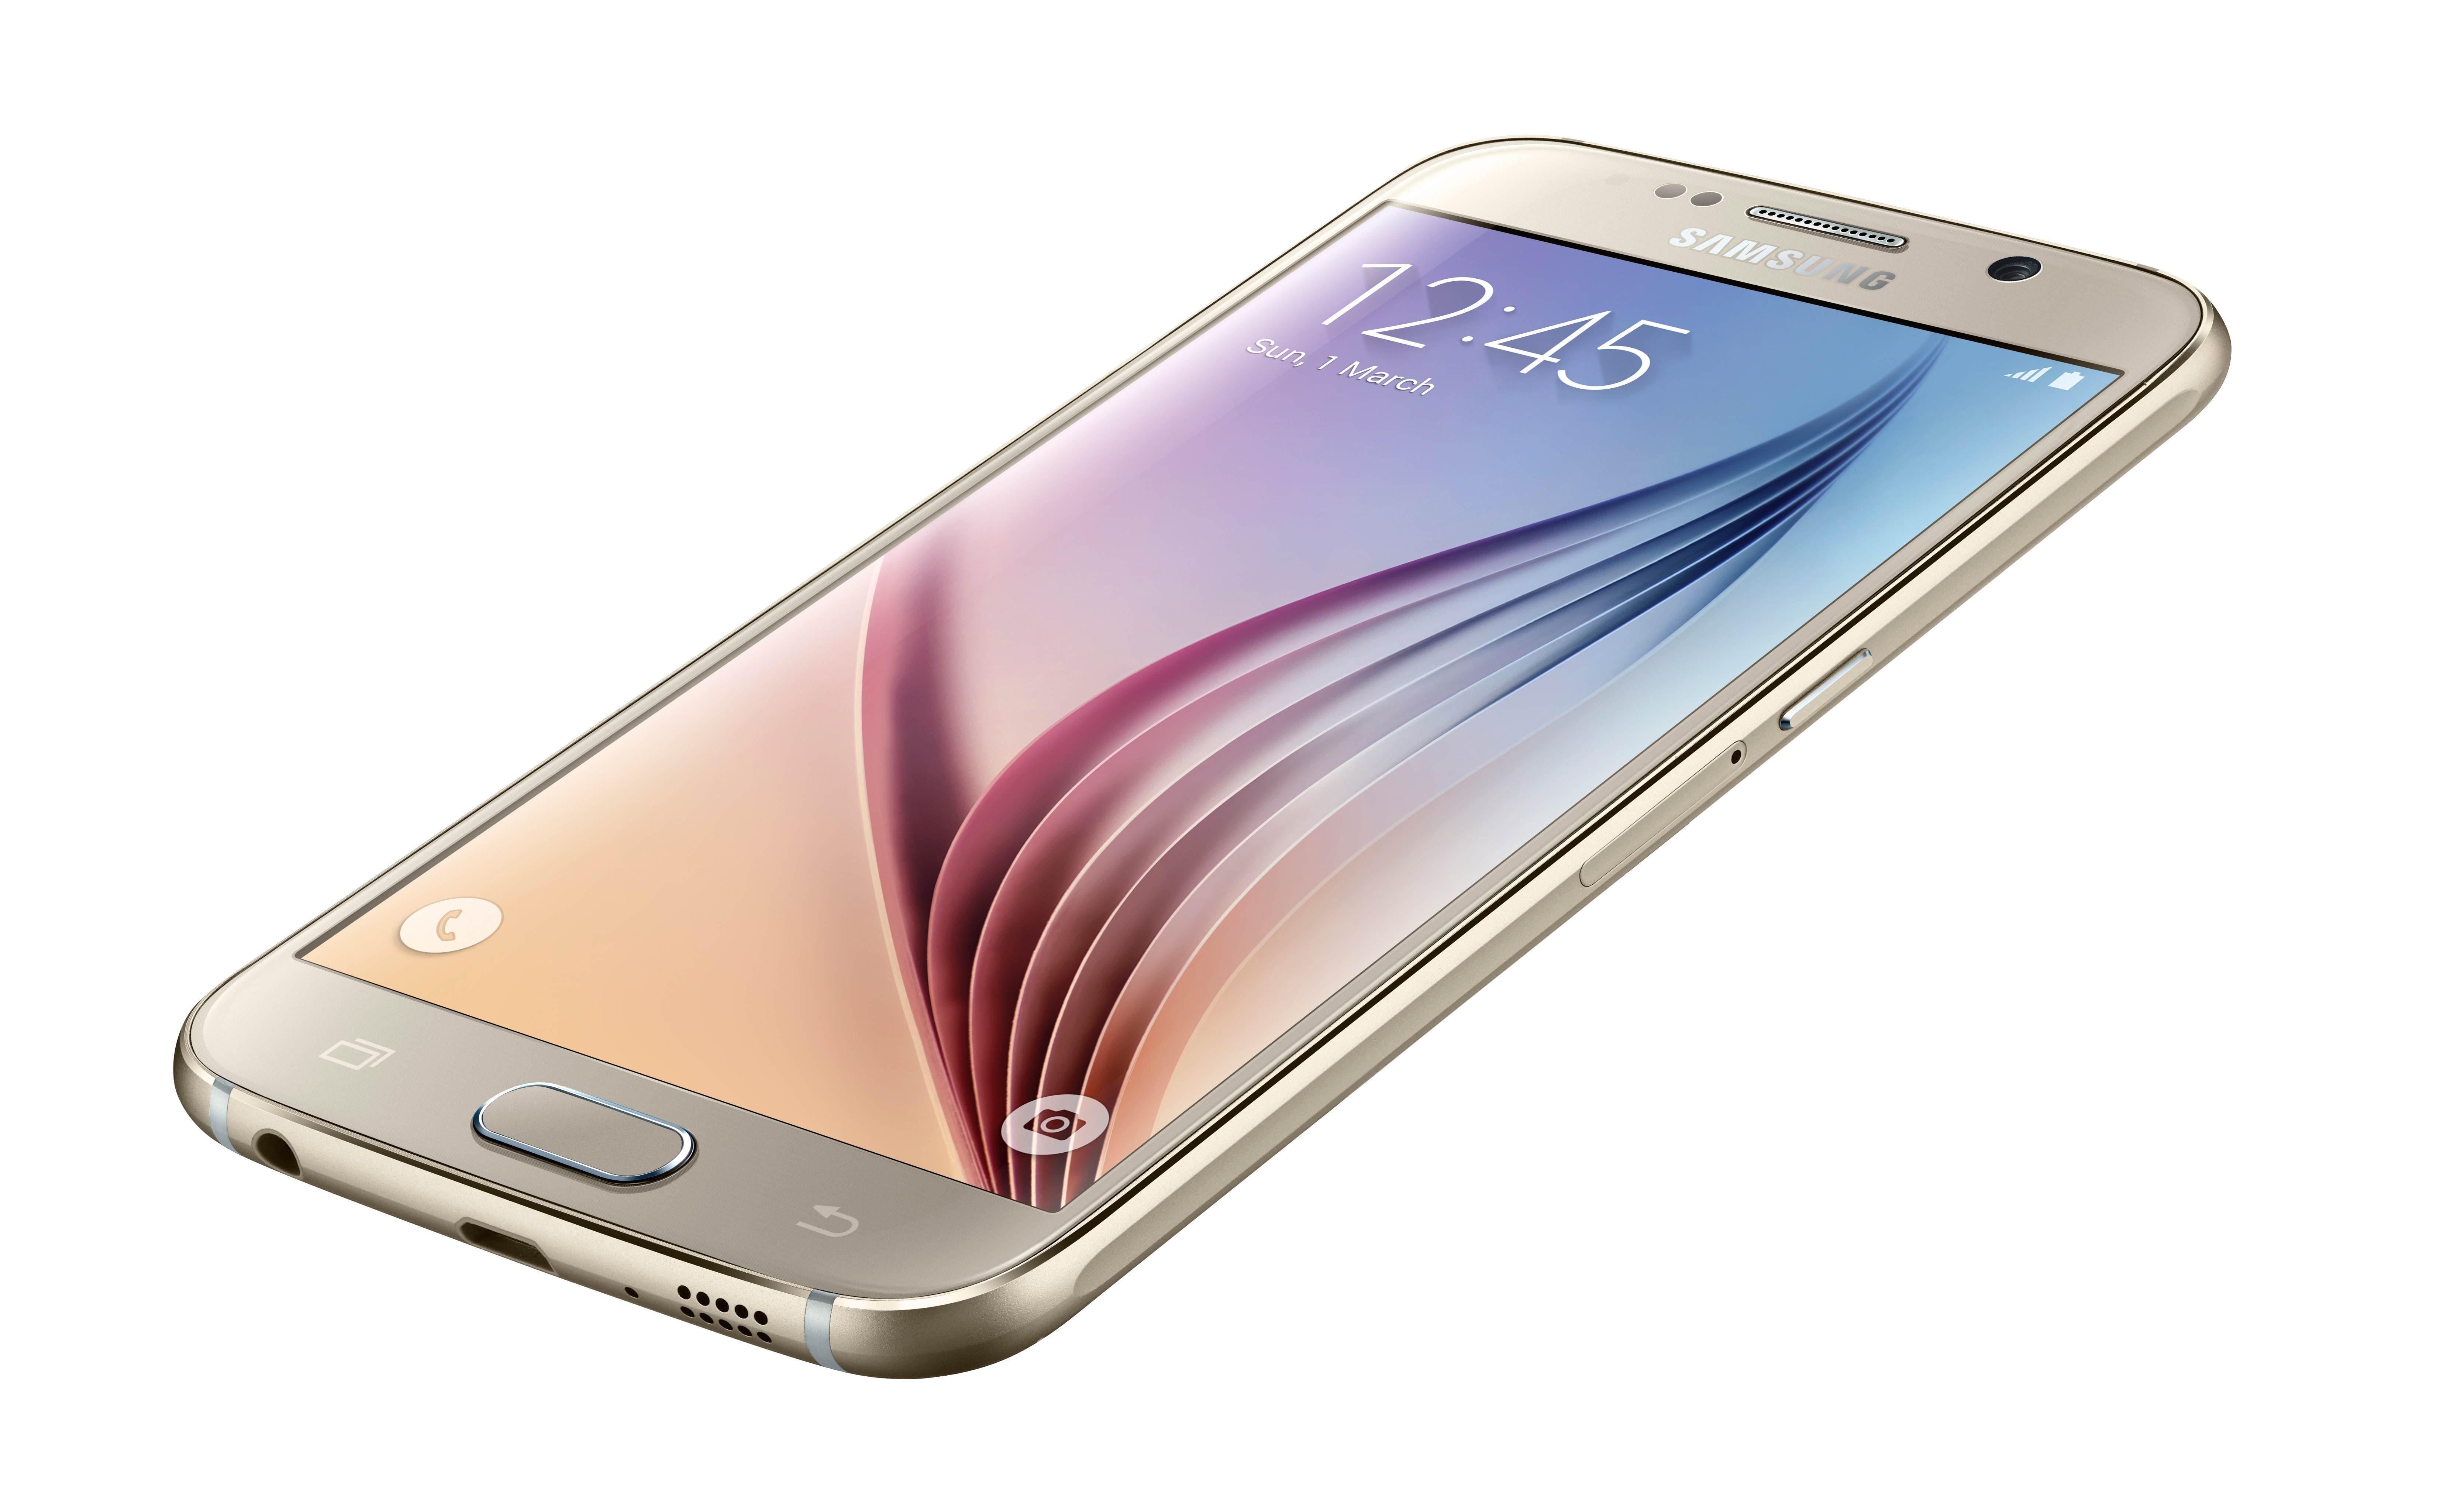 Chollo Samsung Galaxy S6 por 399 euros. Ahorra 50 euros 1 samsung galaxy S6